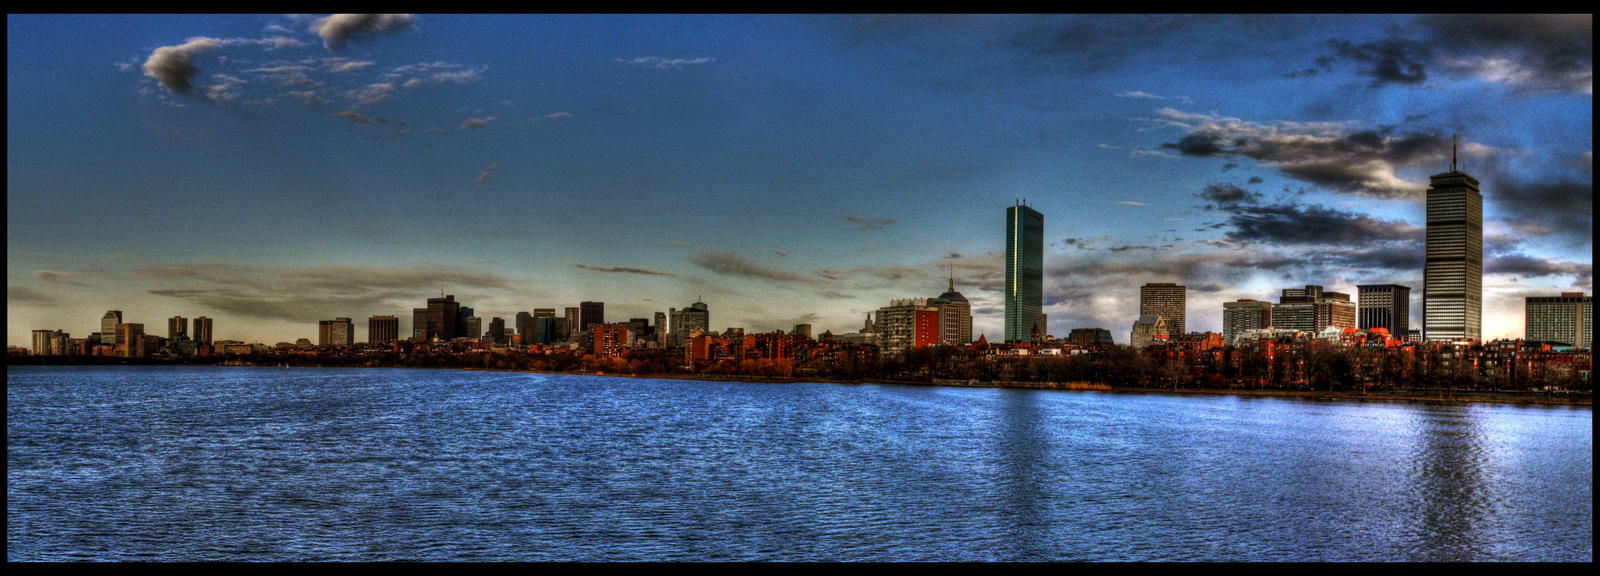 http://fc02.deviantart.net/fs71/i/2011/127/f/2/boston_panorama_by_bozonio-d3fsd38.jpg